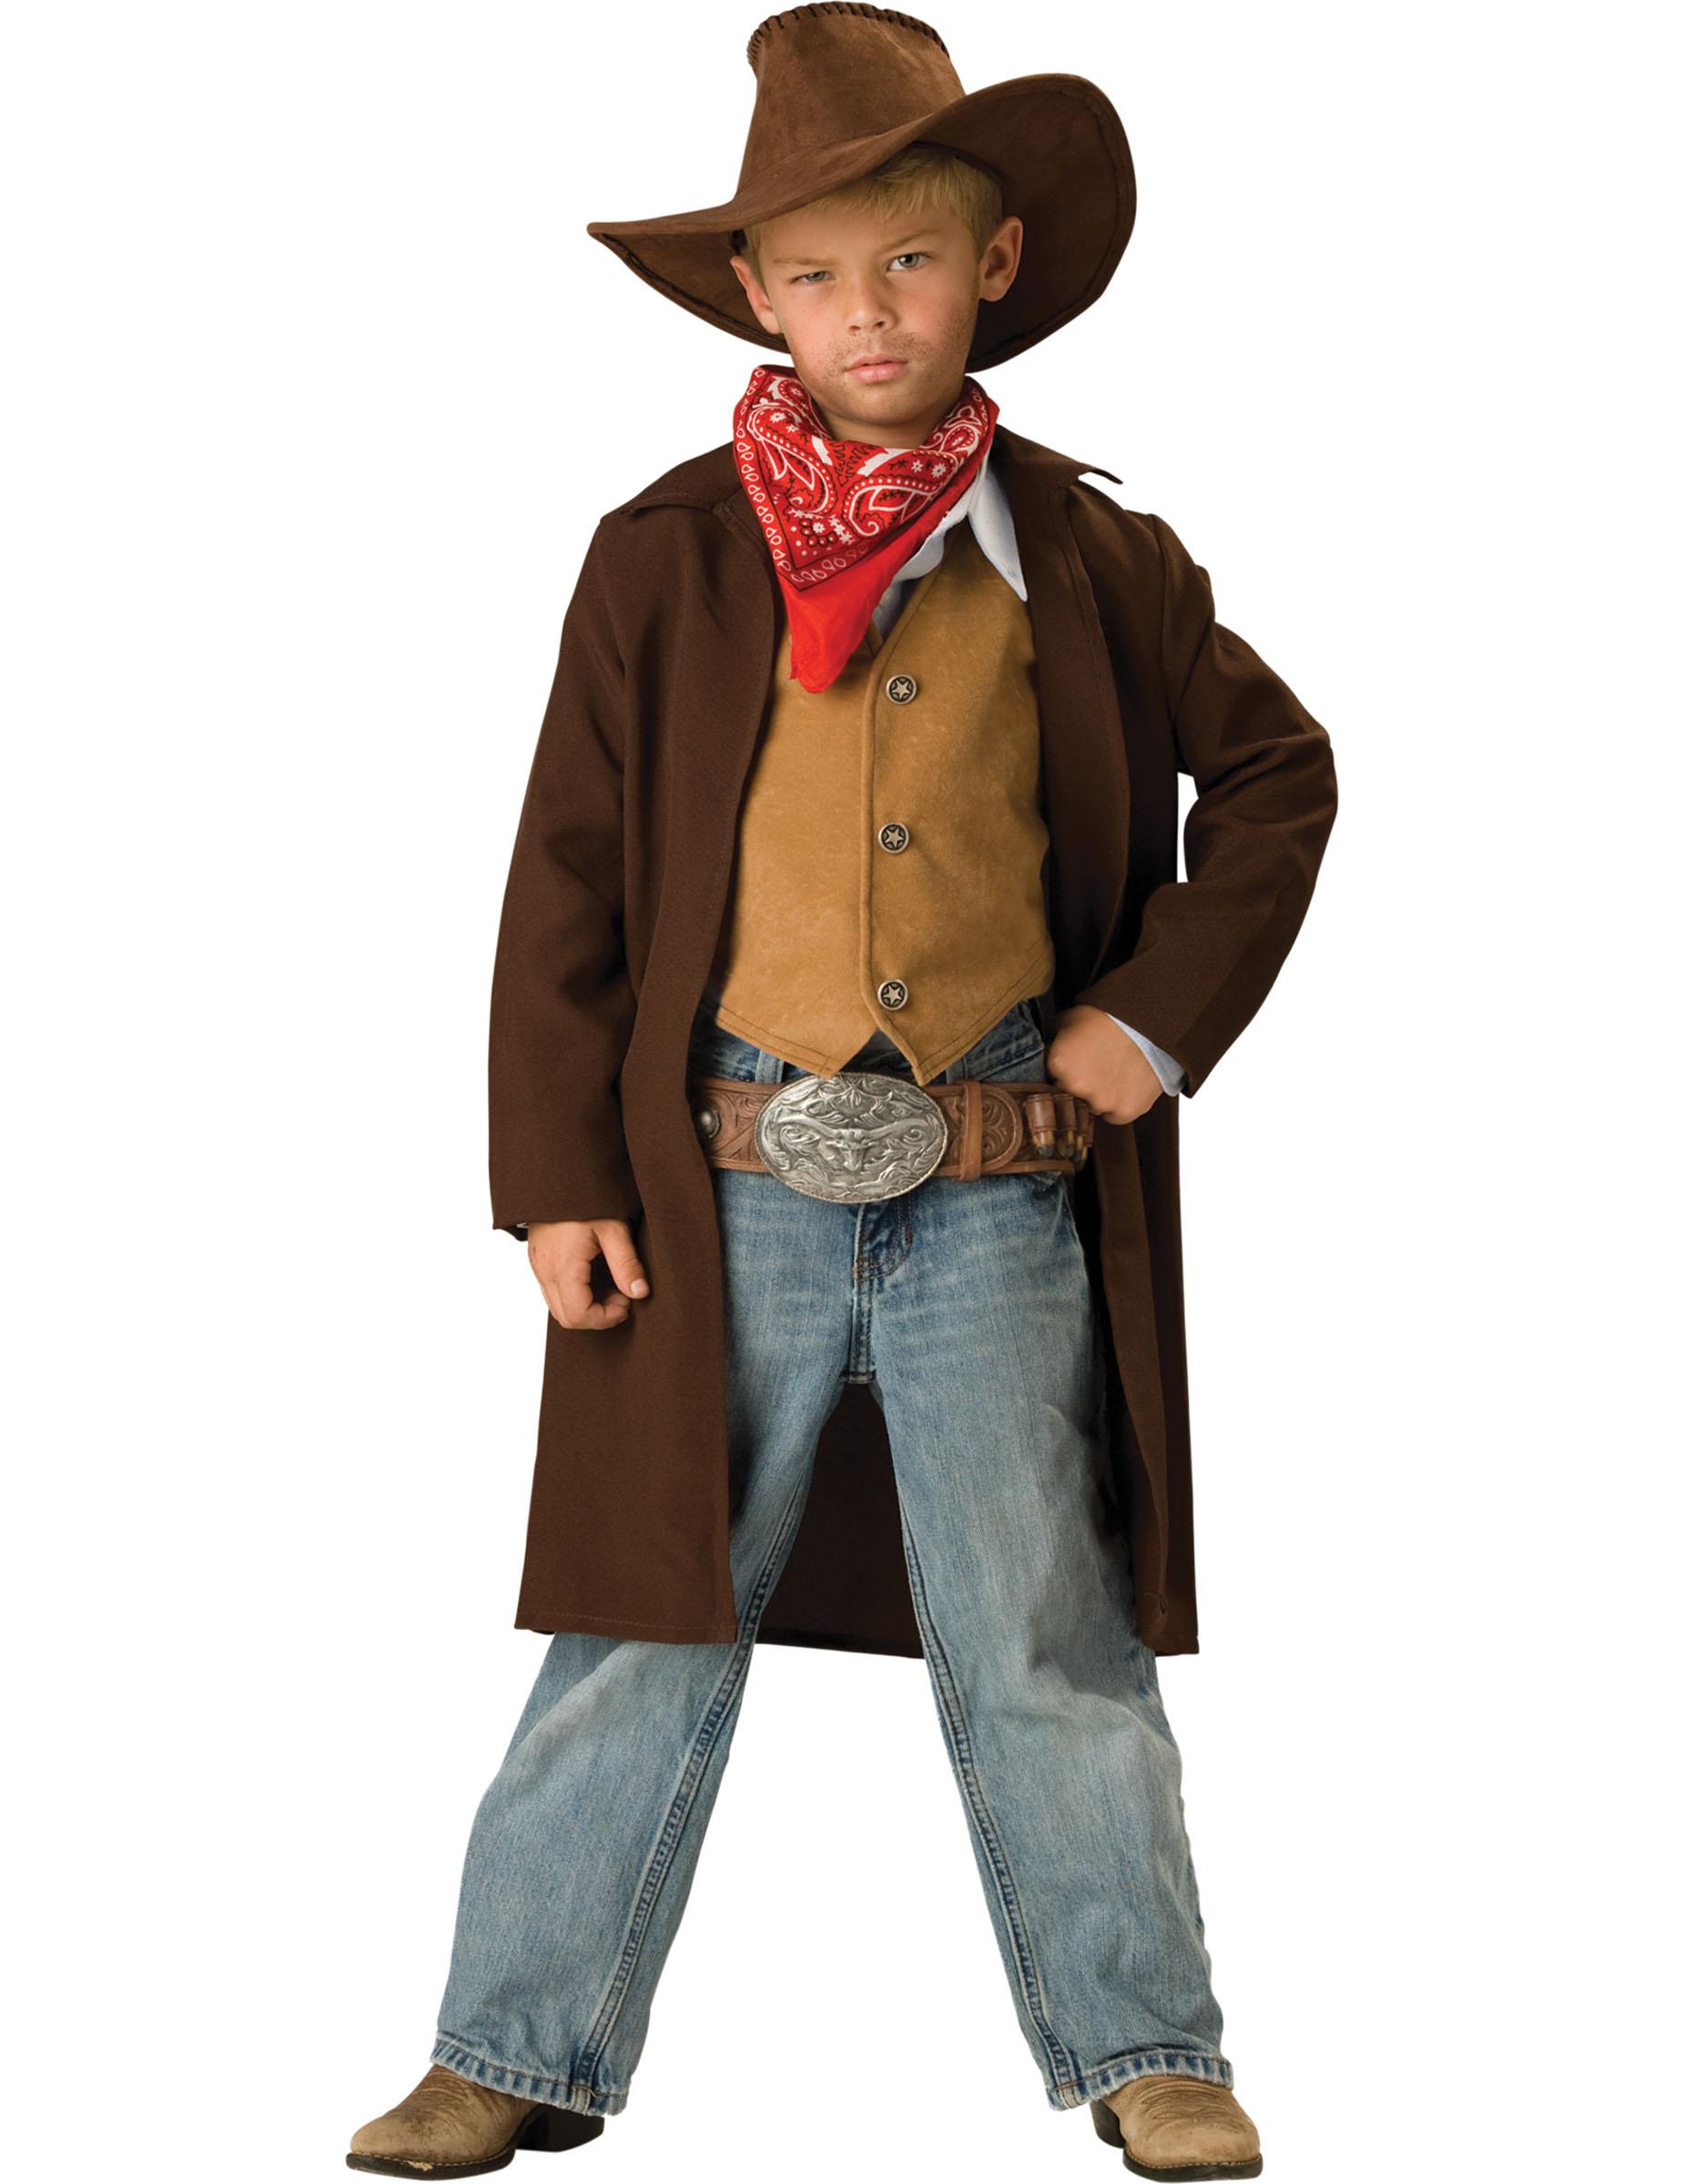 Cowboy Kinder Kostum Braun Rot Gunstige Faschings Kostume Bei